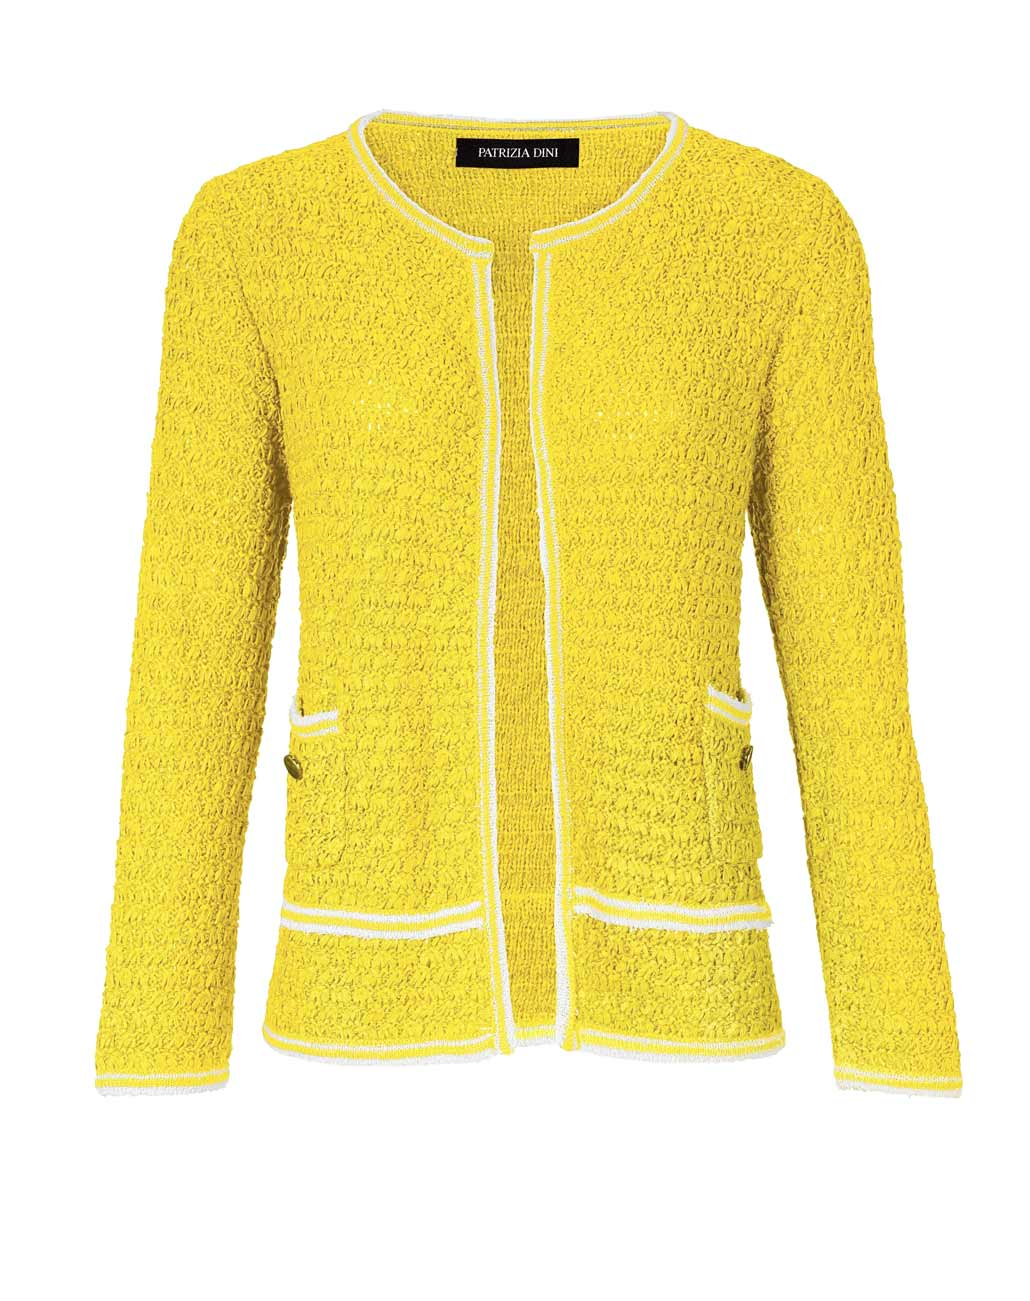 023.835 Damen Strickjacke neu Damen Cardigan Pullover gelb Blazer Jacke Strick